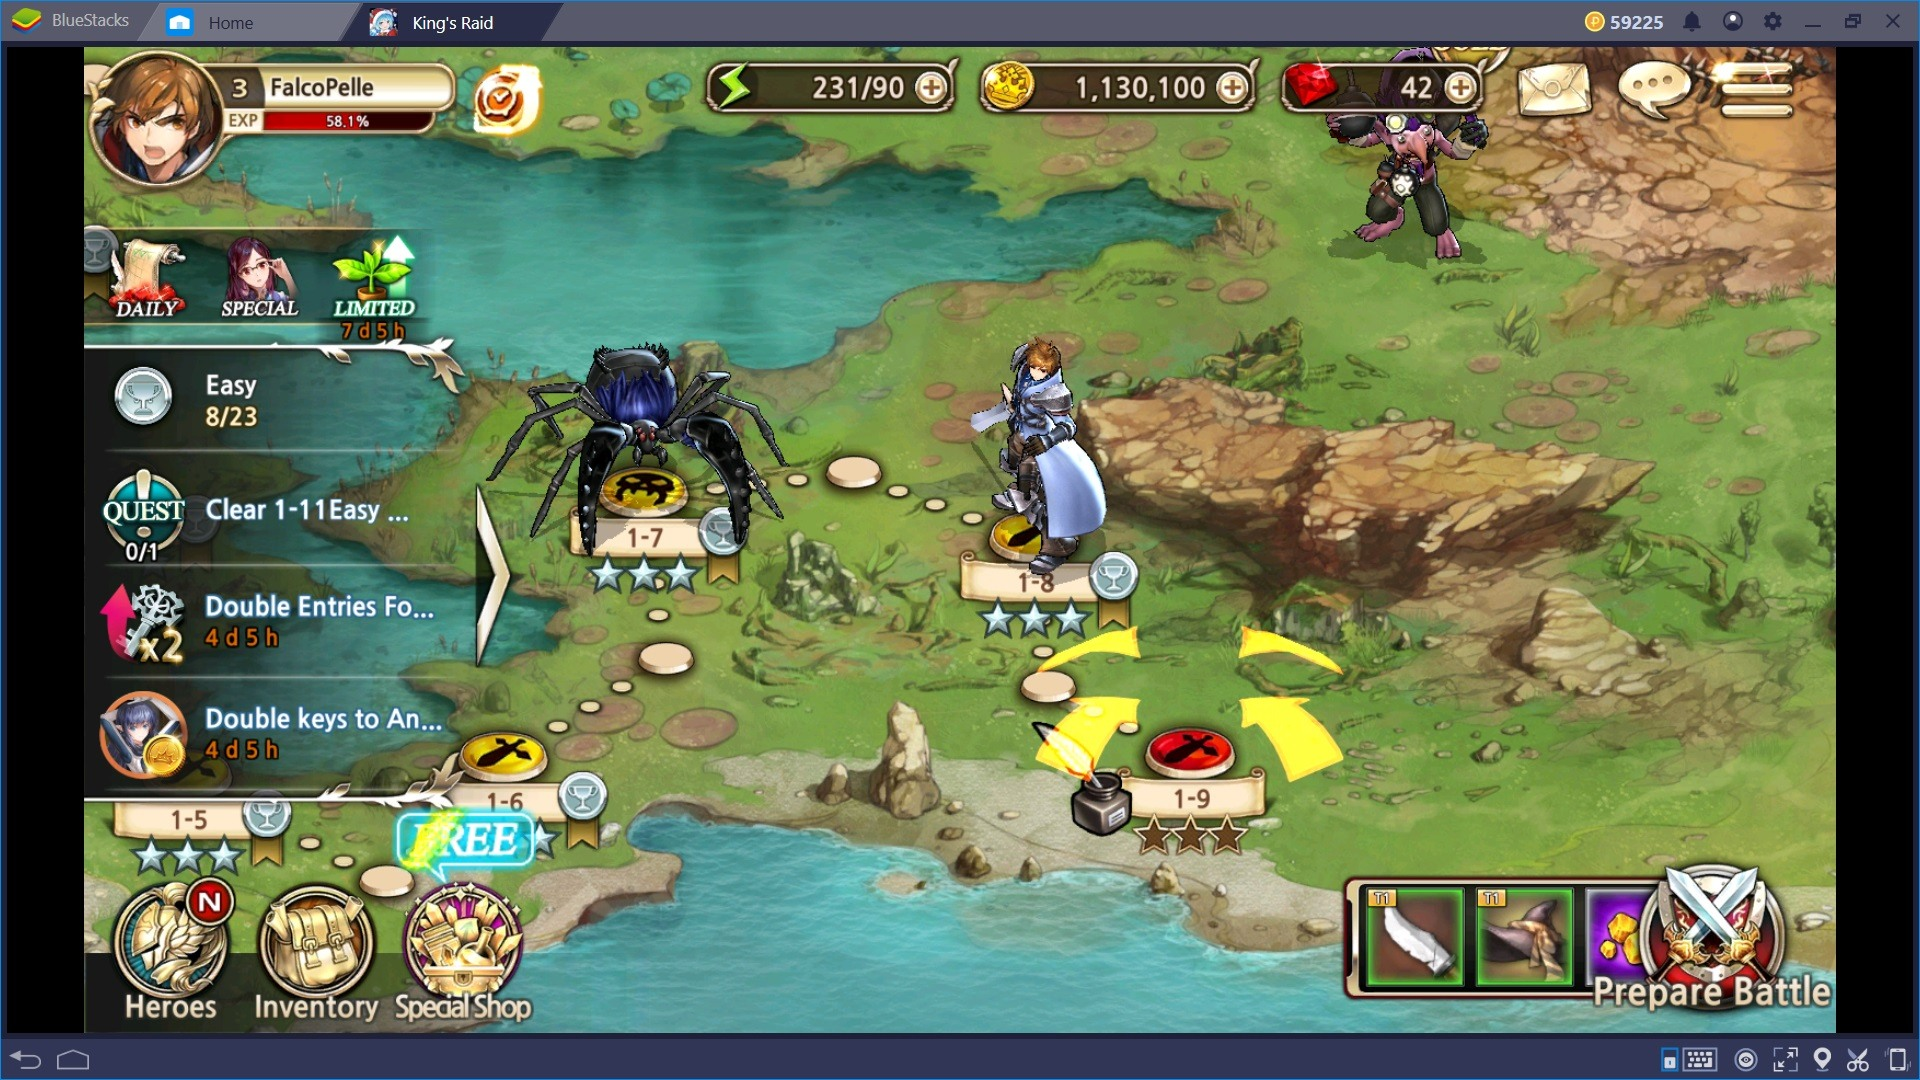 Gioca con Bluestacks a King's Raid: Setup e Controlli